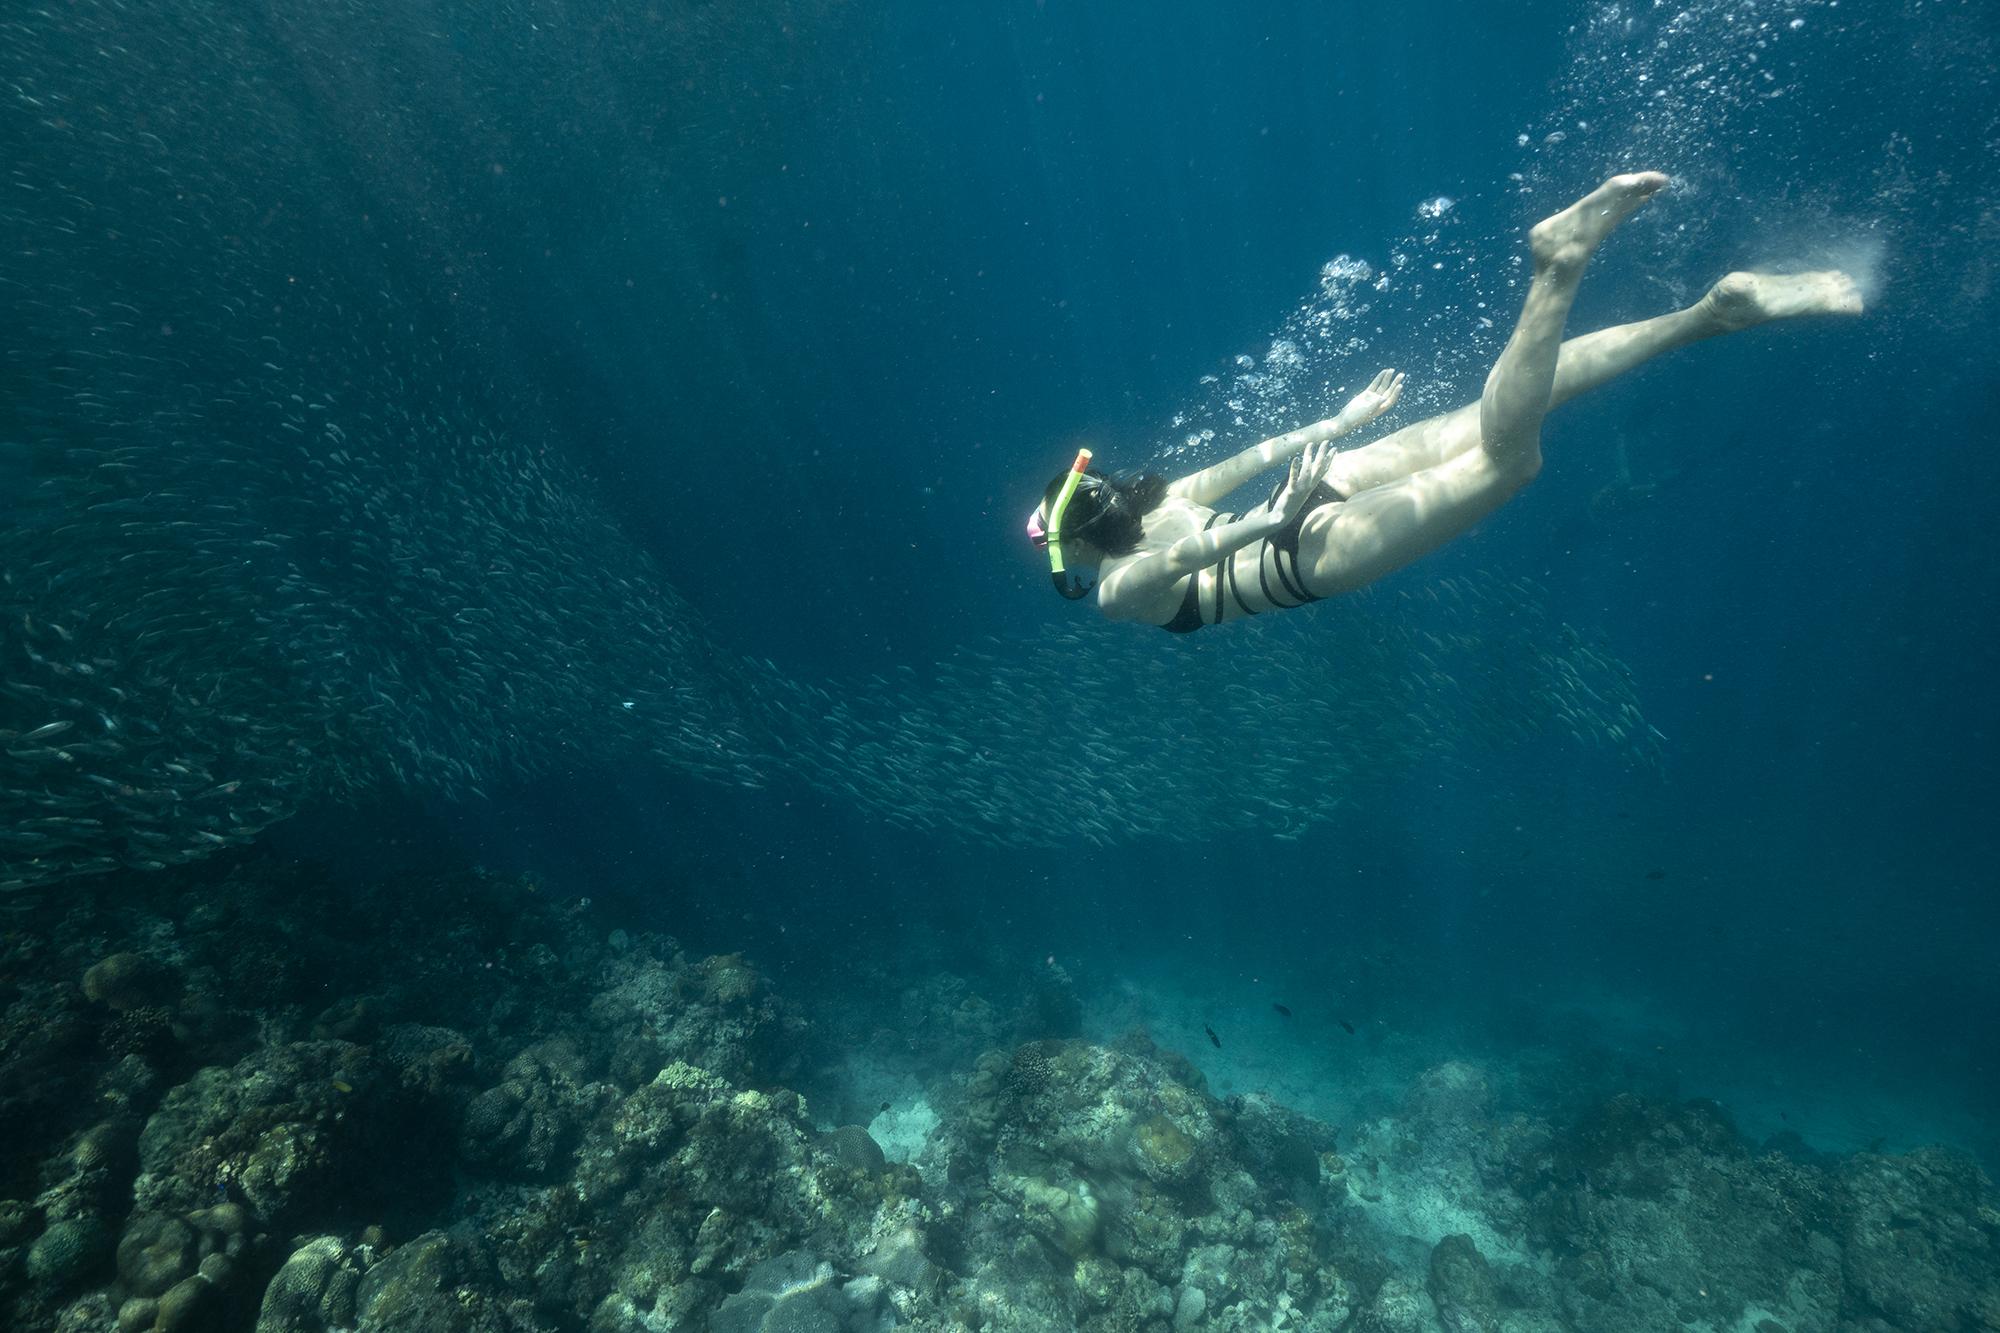 WhaleShark-Cebu-Oslob-hobo-life-sardines-anna-k-lee